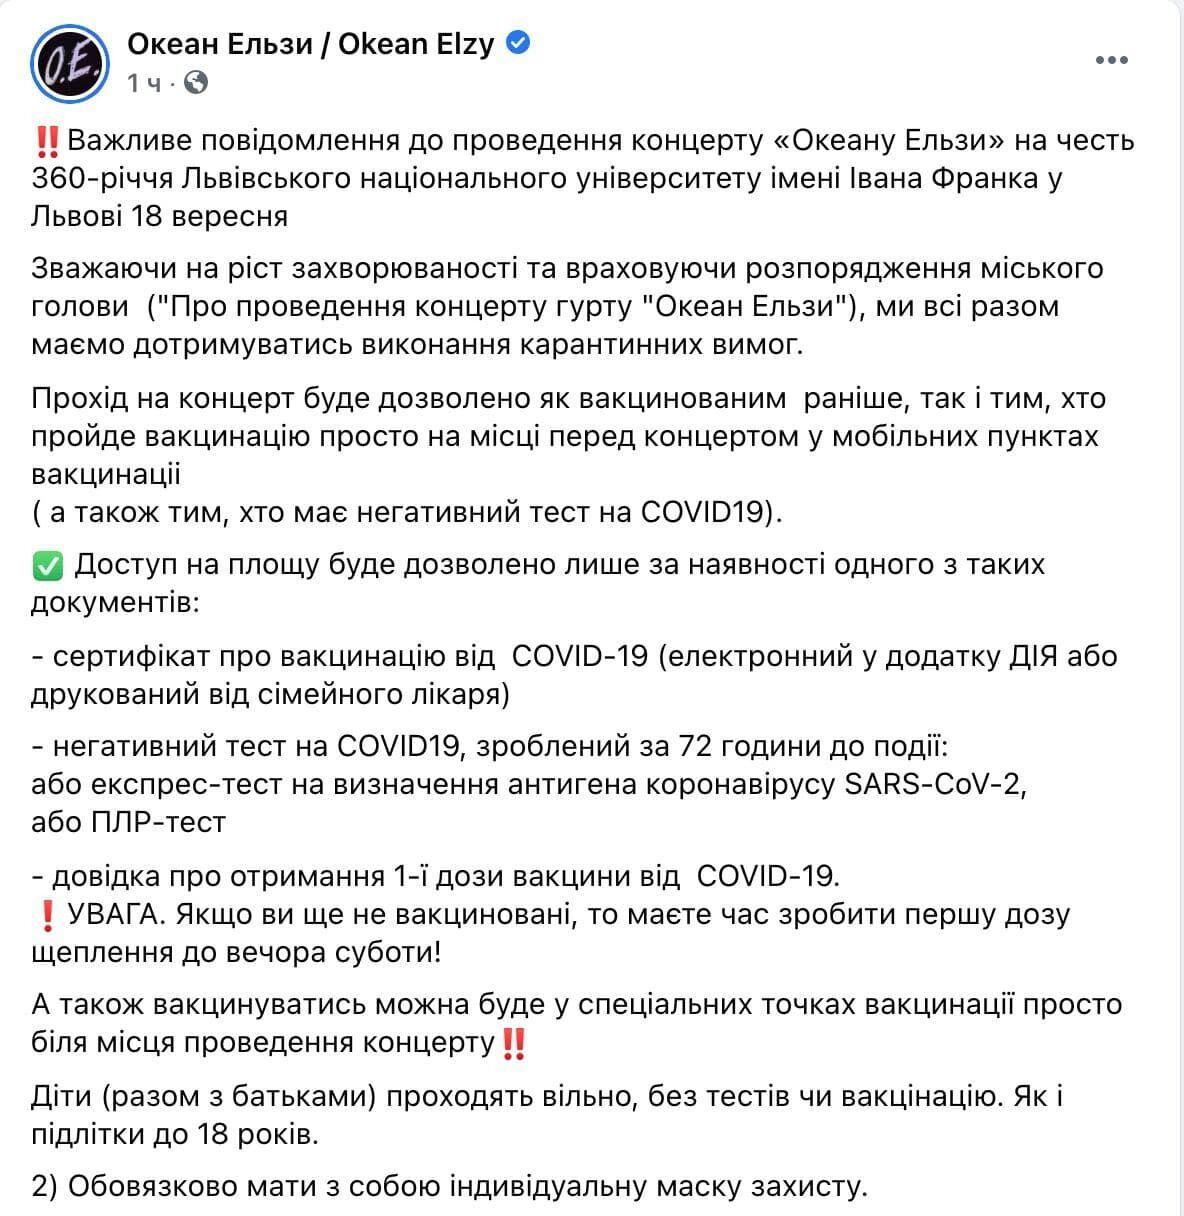 Публикация про концерт во Львове.